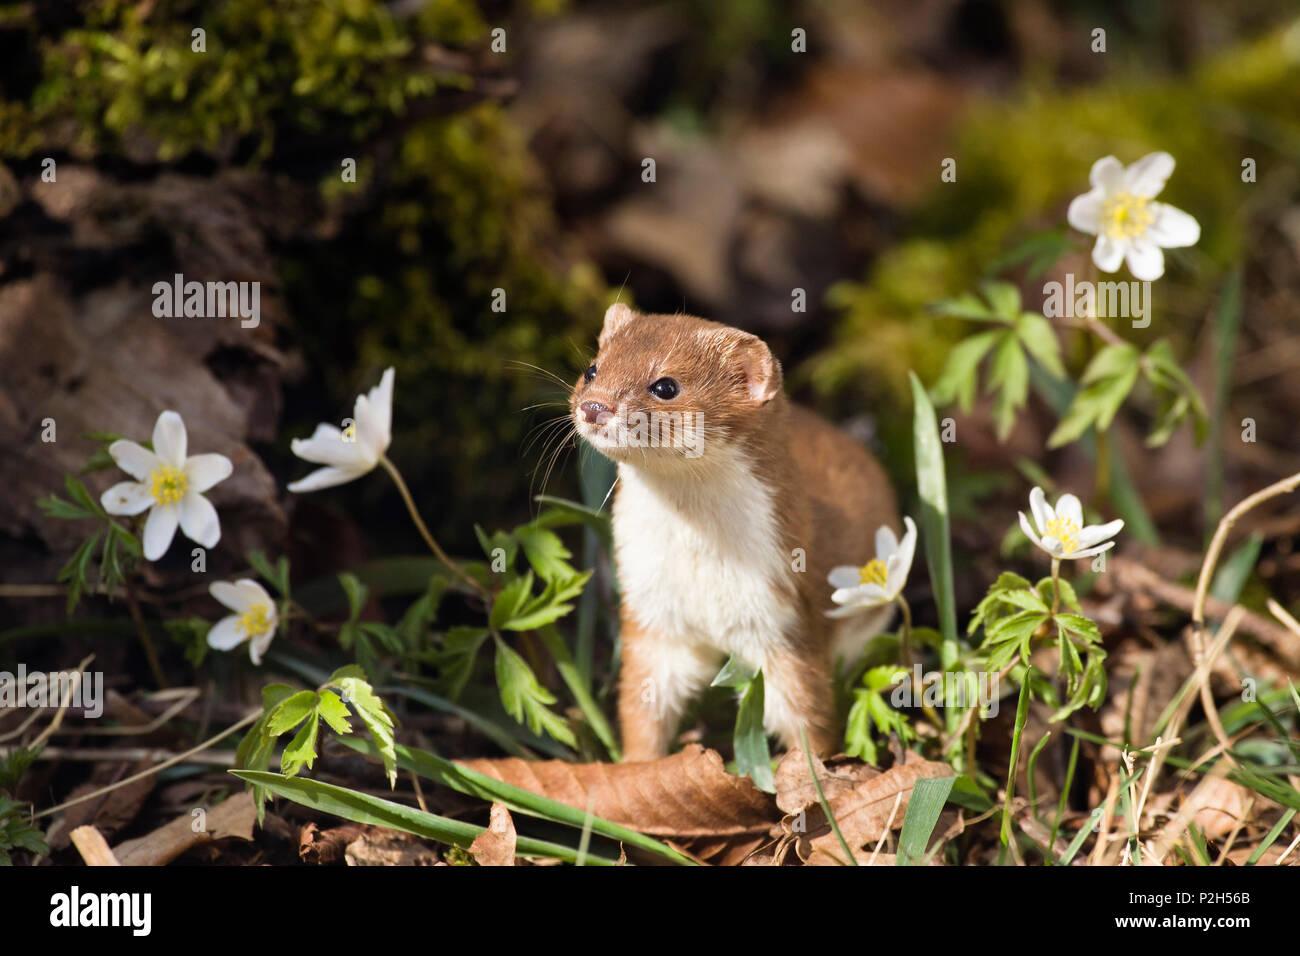 Weasel standing upright, Mustela nivalis, Germany - Stock Image